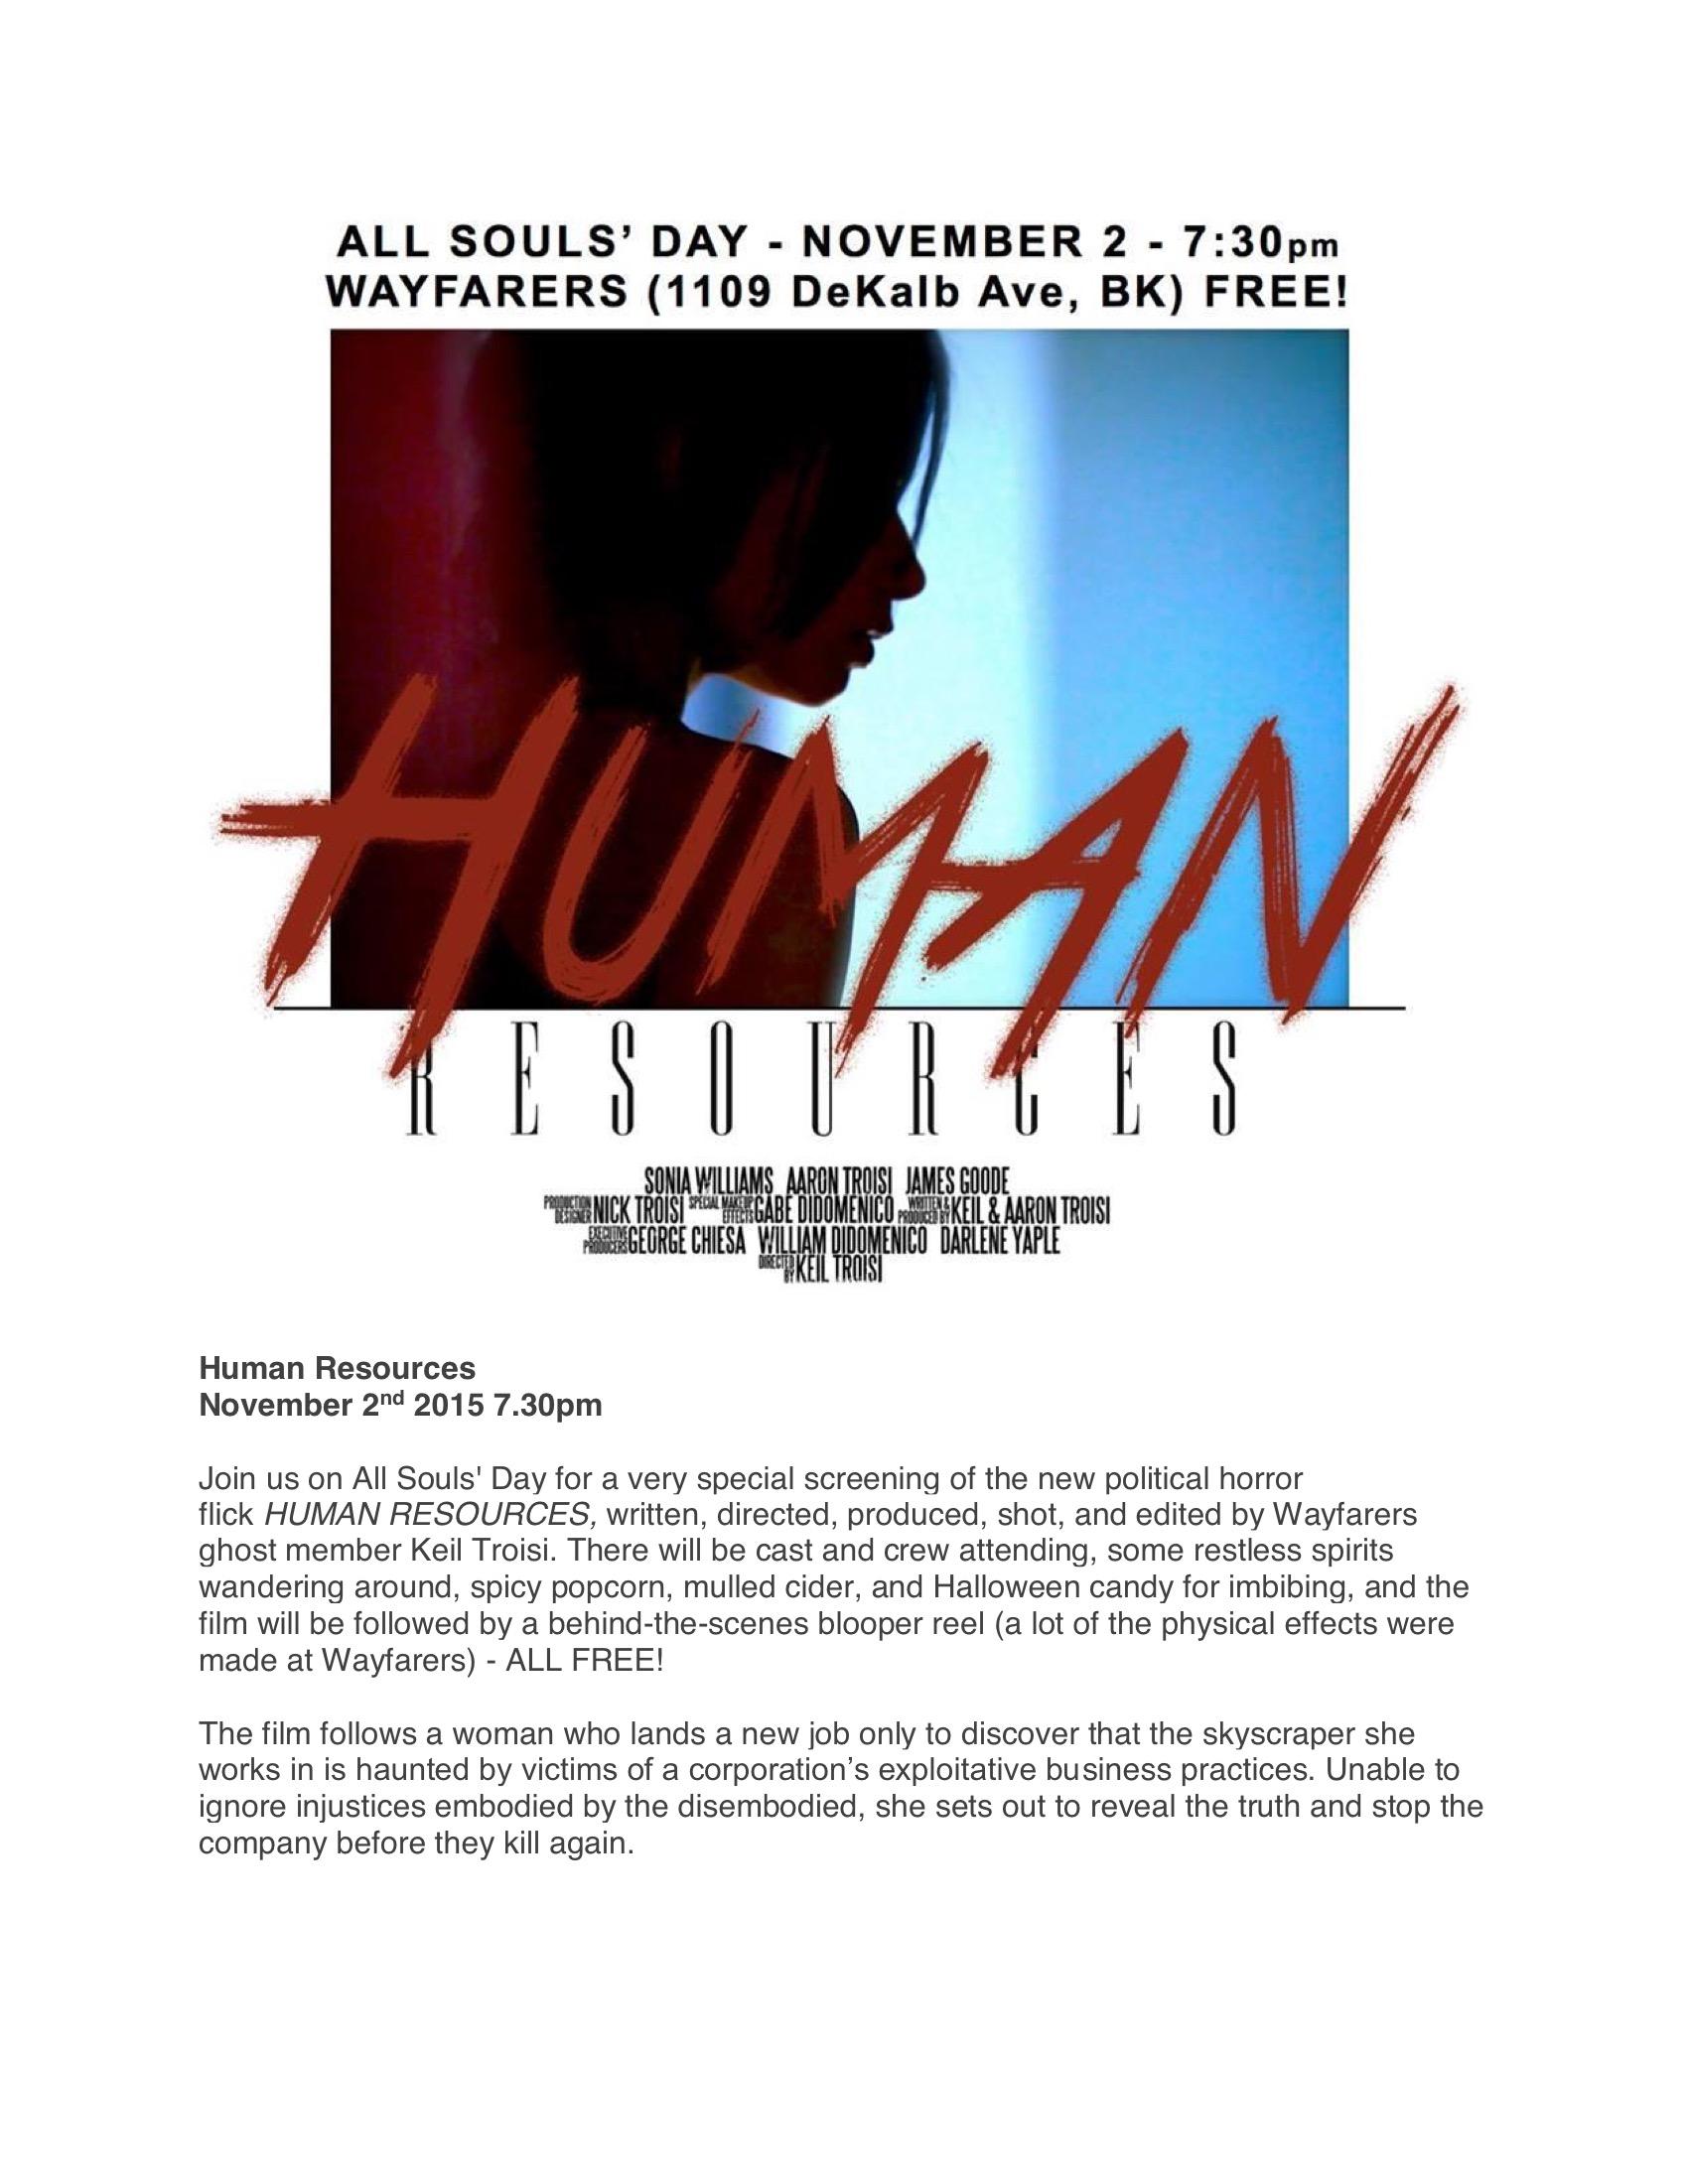 Human Resources-1.jpeg